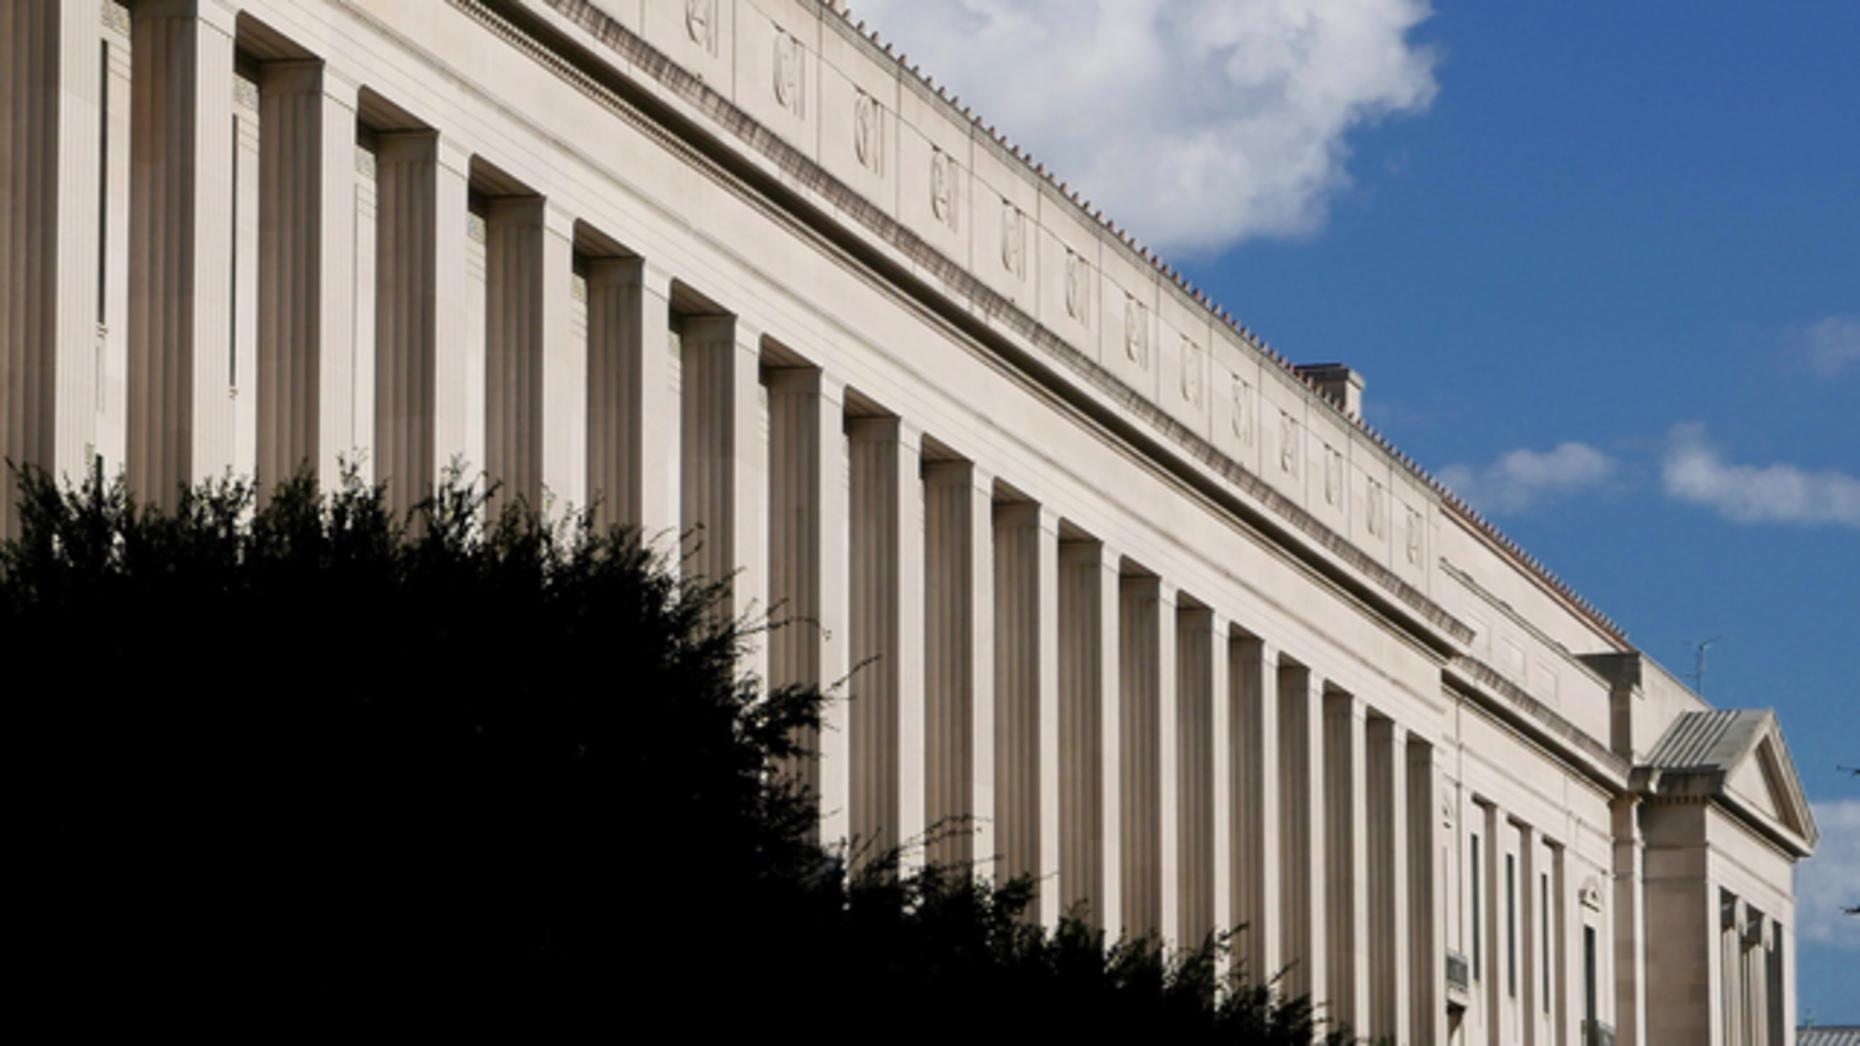 U.S. Department of Justice, Washington, D.C. Photo: AP